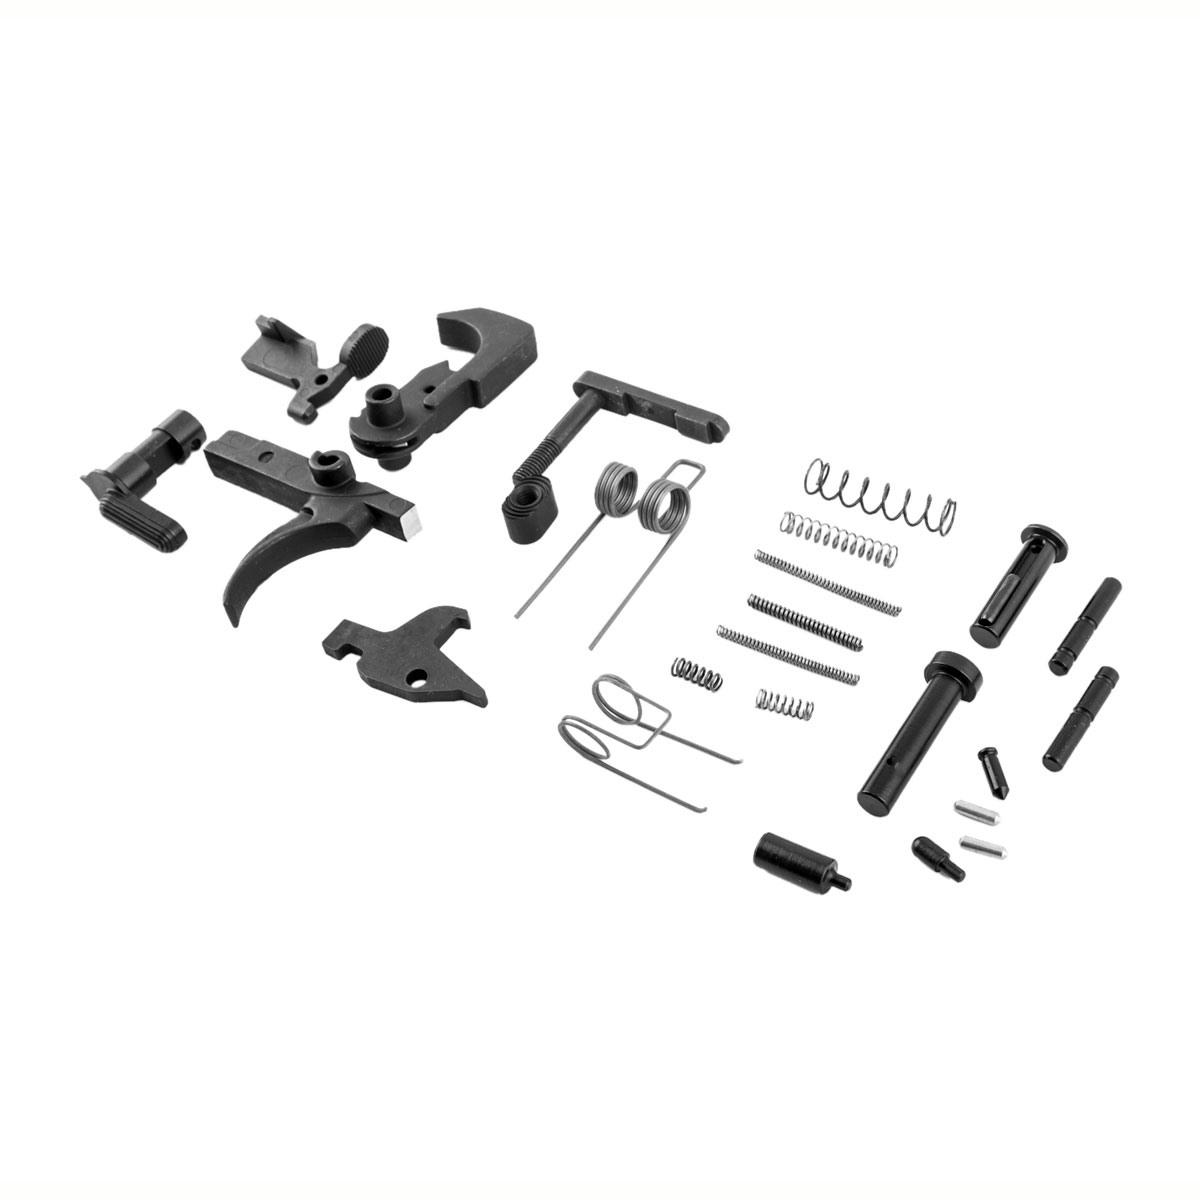 Critical Capabilities Llc Ar 15 Lower Parts Kit